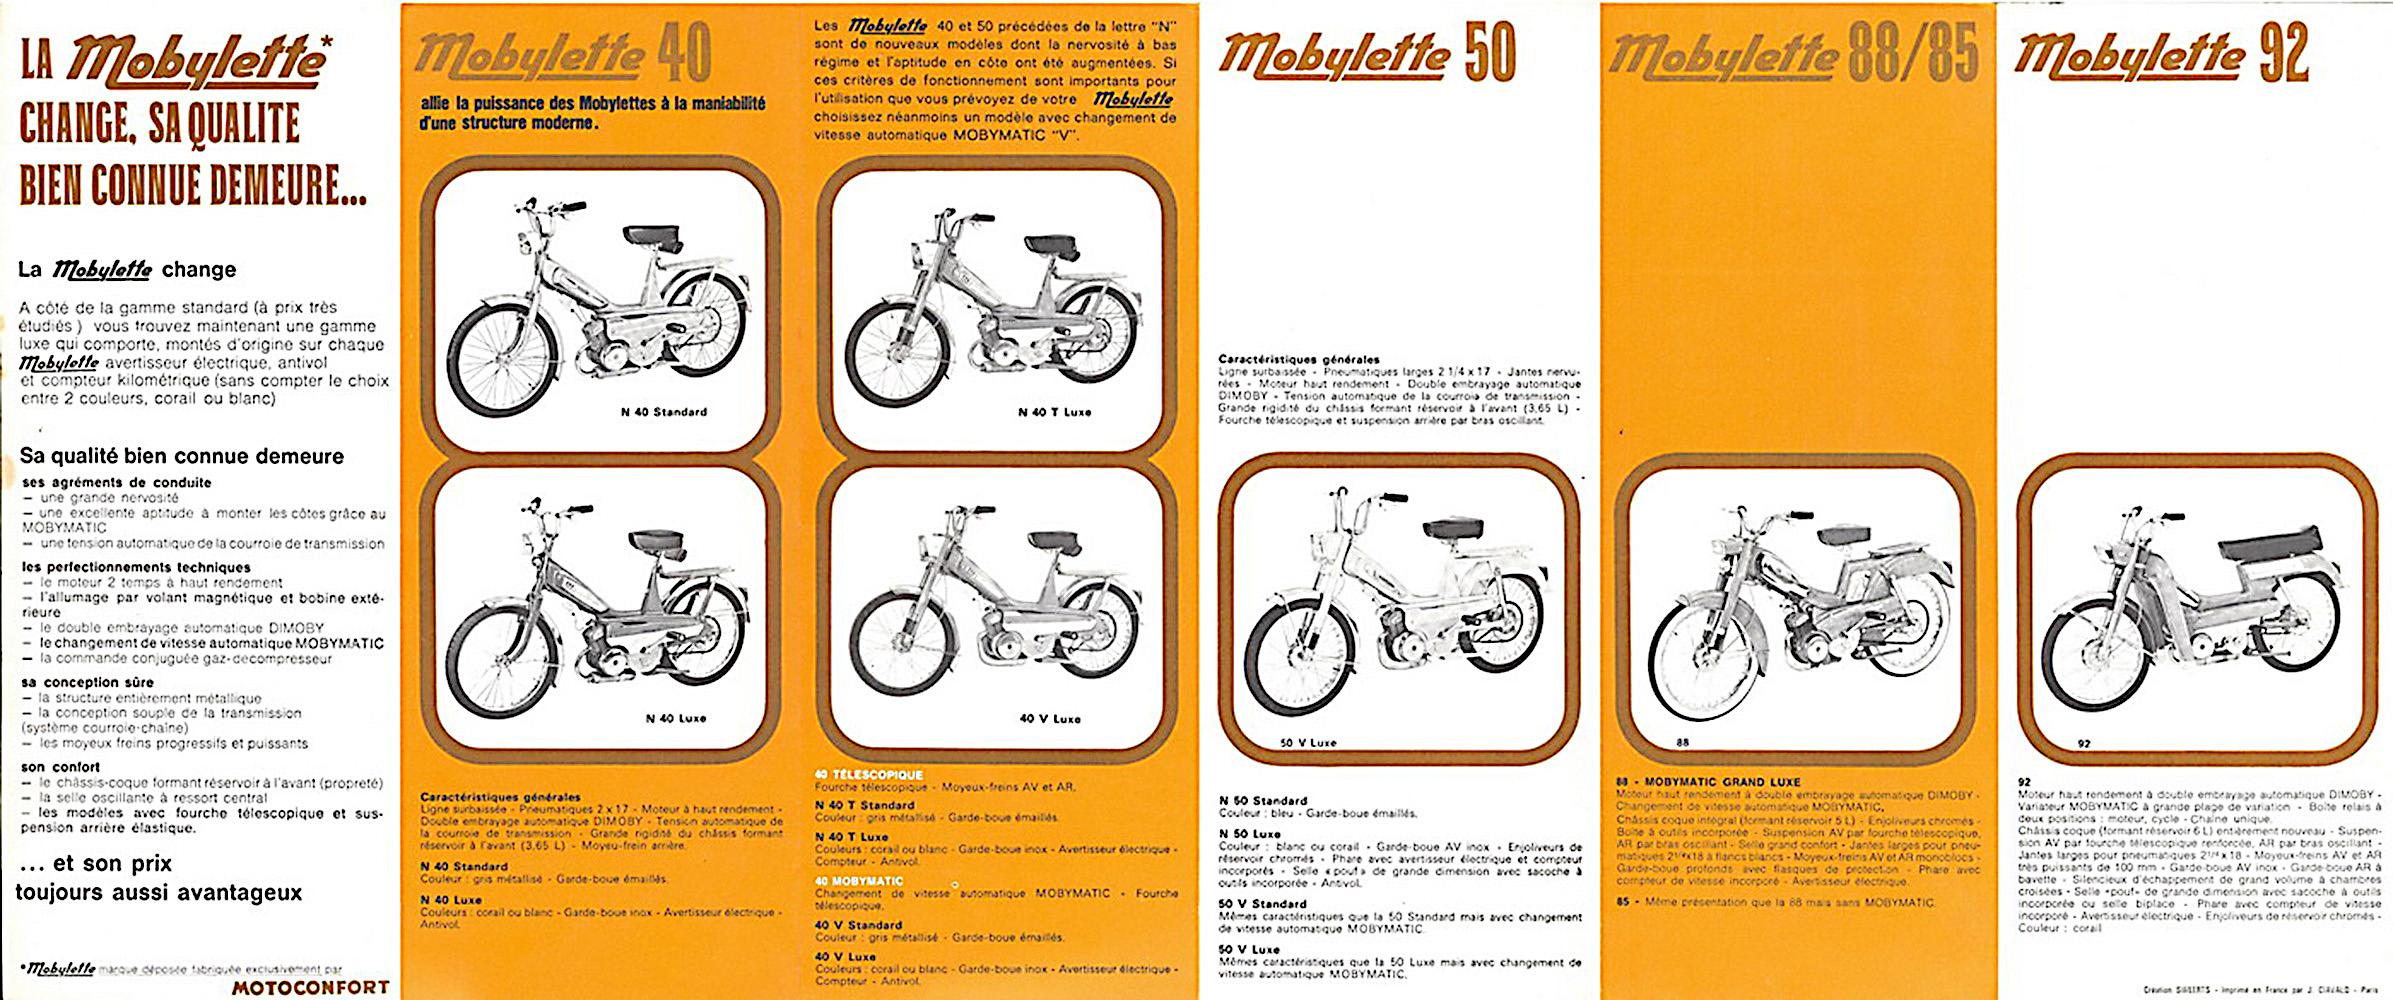 motoconfort AU 56 et N50 A_197210